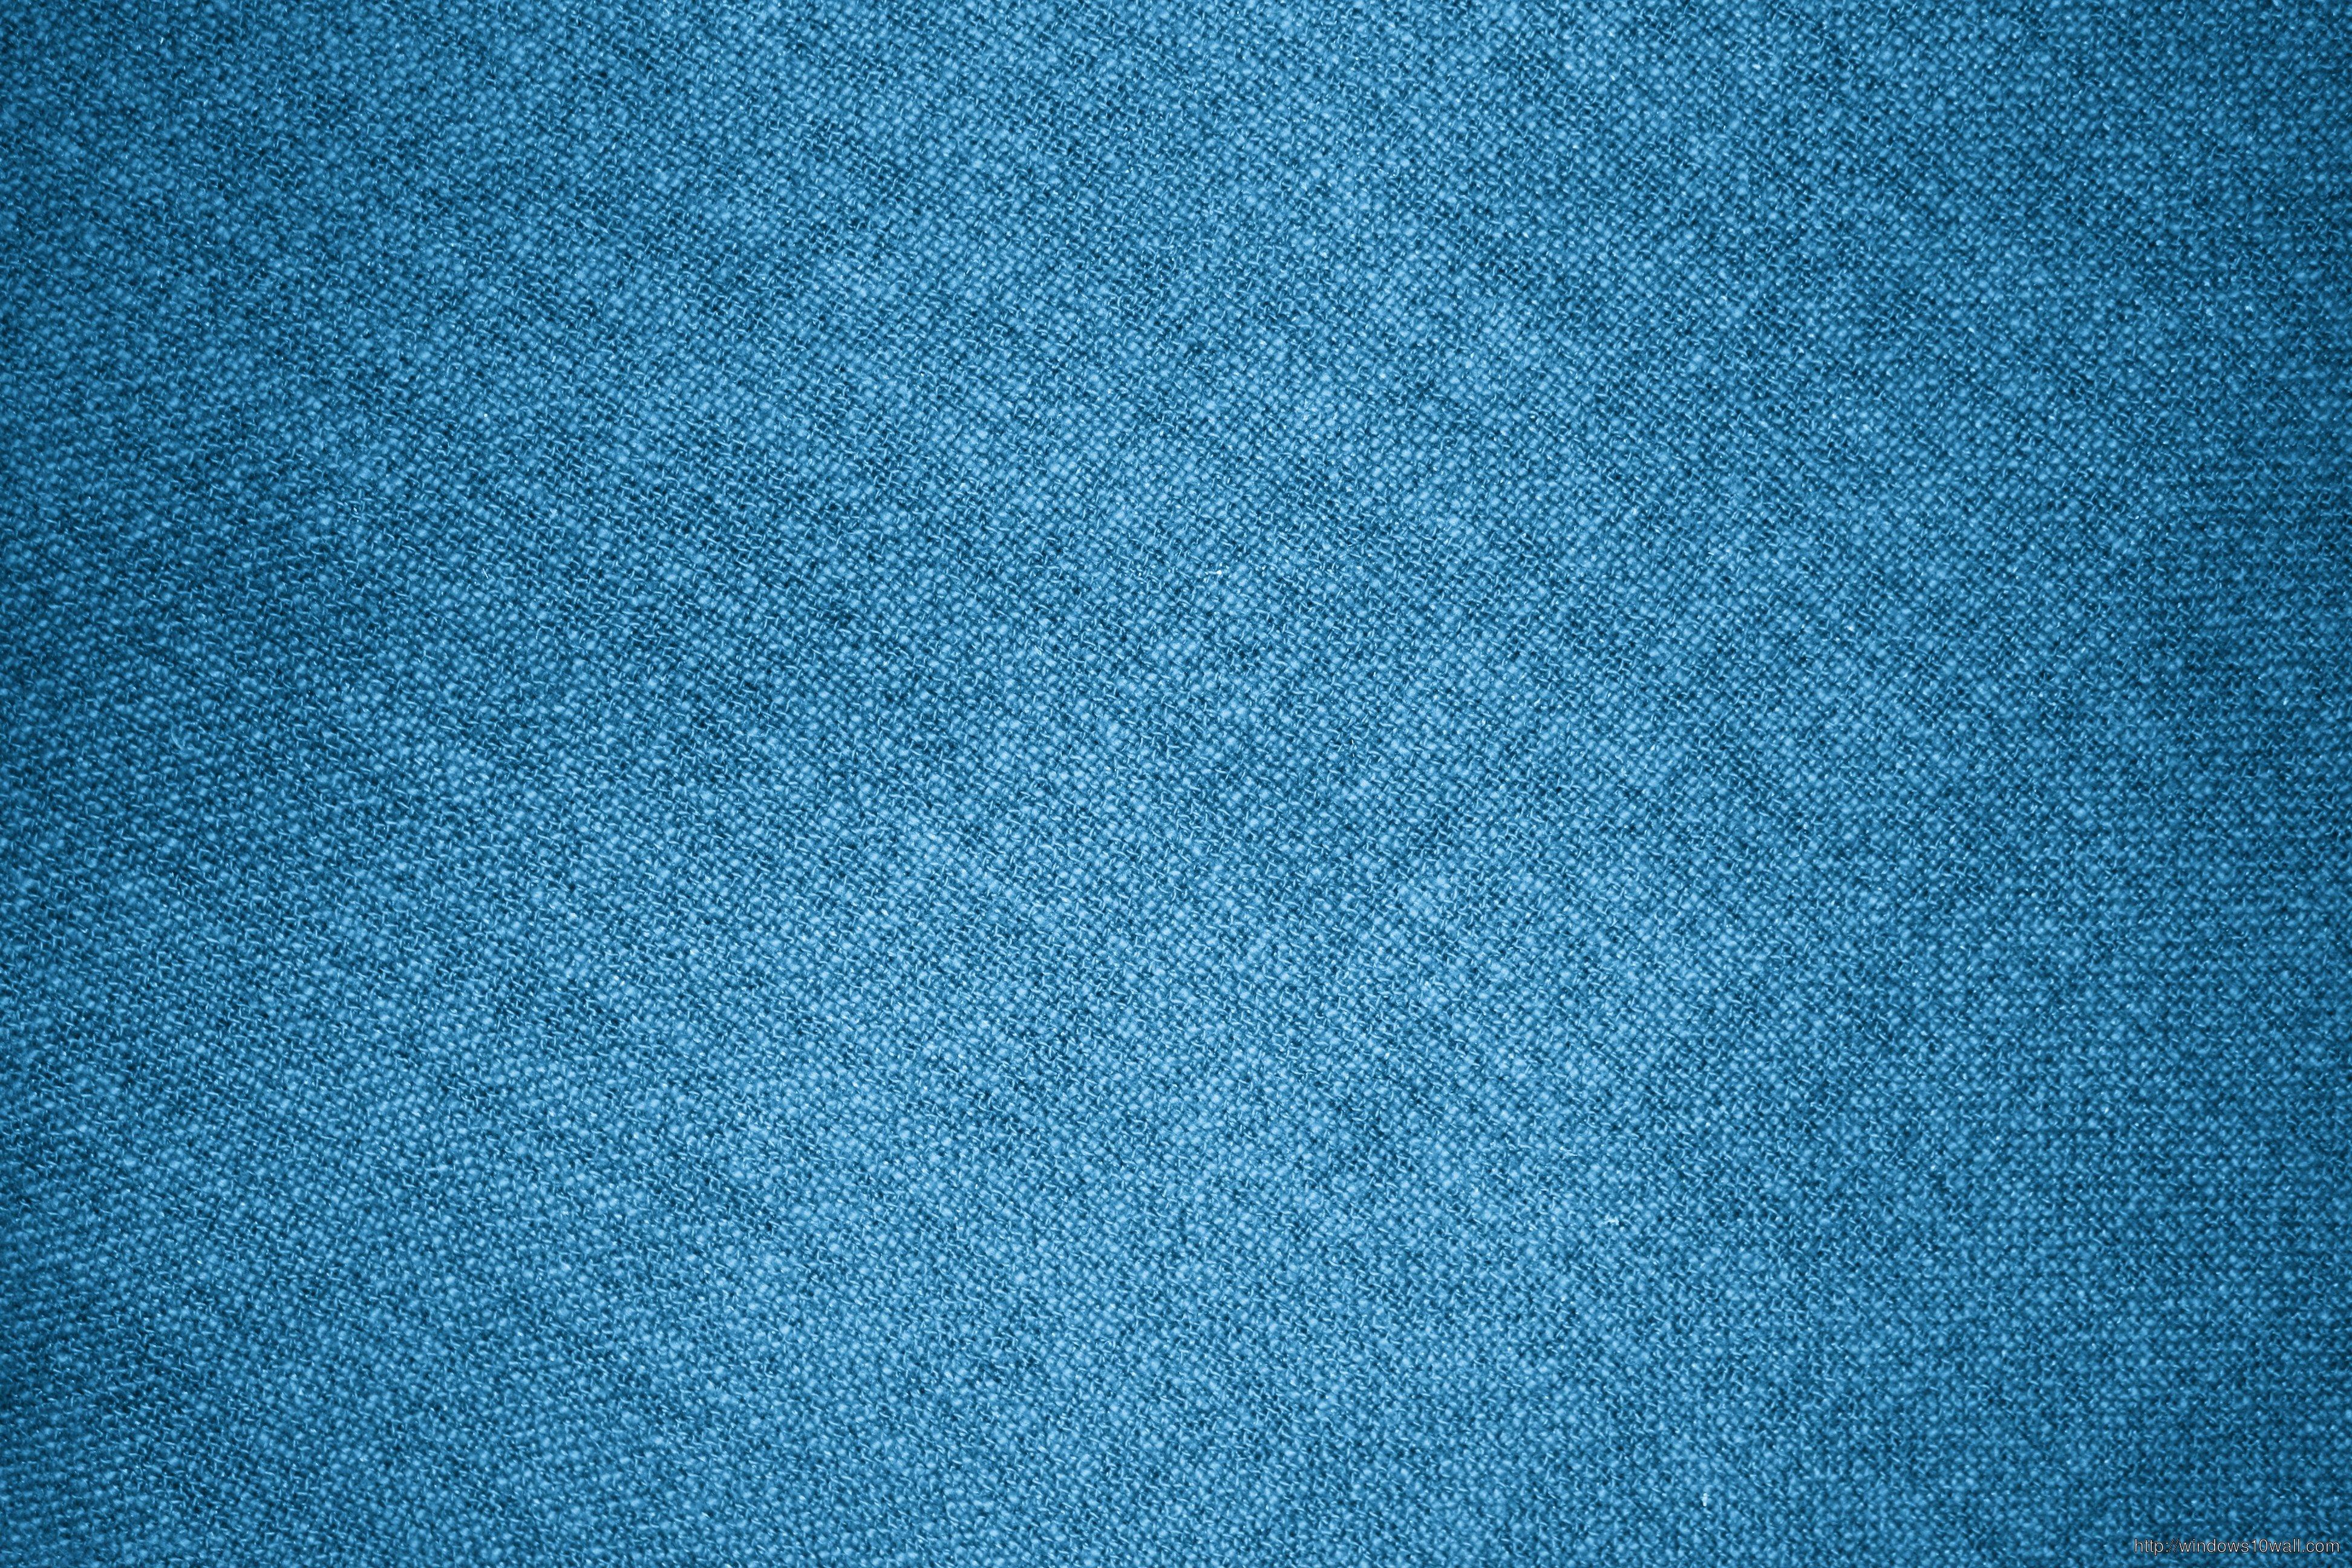 Backgrounds For Azure Blue Background | www.8backgrounds.com